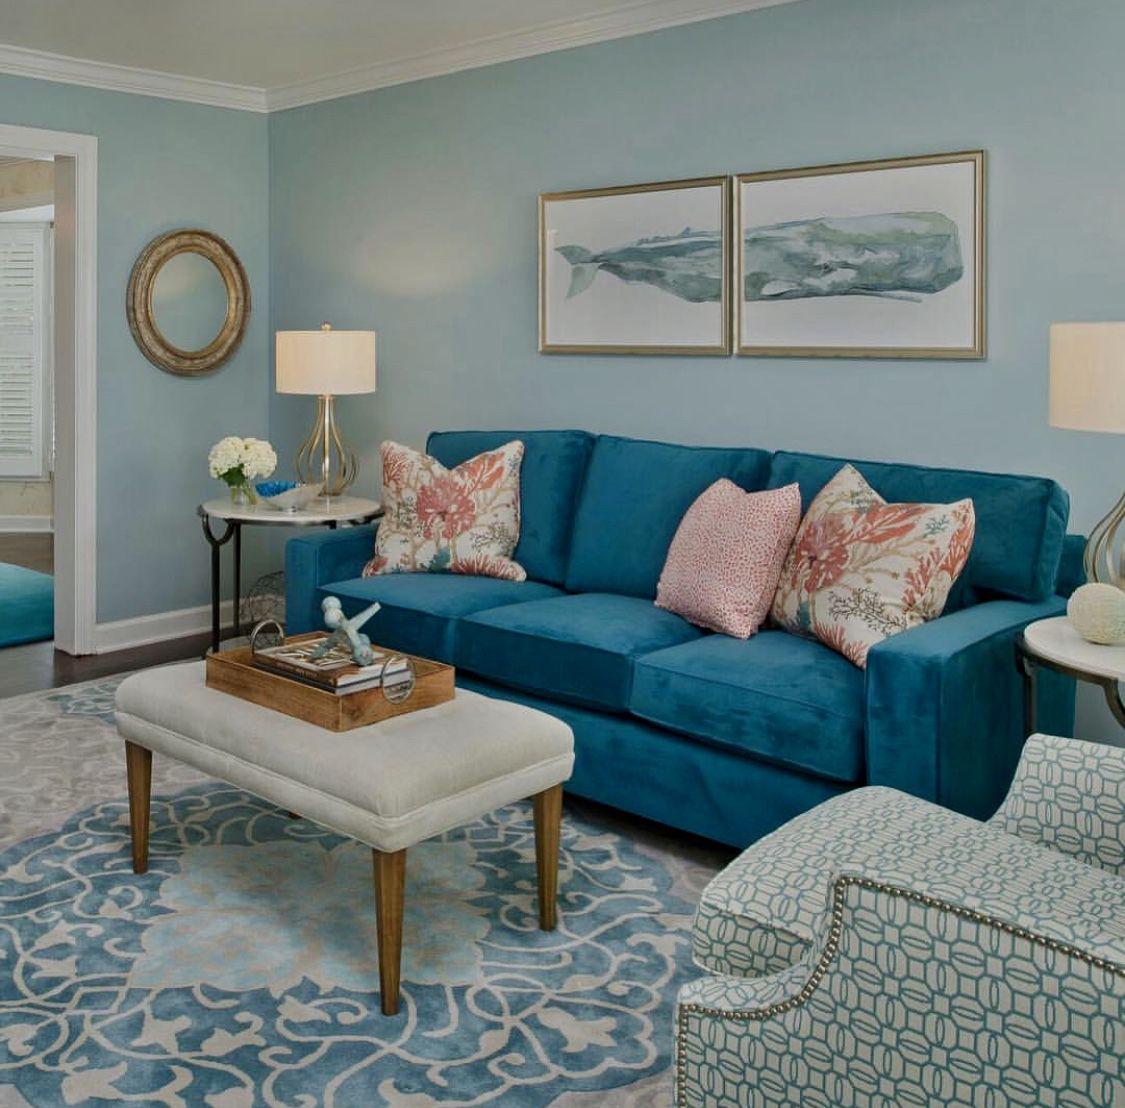 Teal Sofa Teal Living Rooms Teal Sofa Living Room Blue Living Room Decor #teal #sofa #living #room #decor